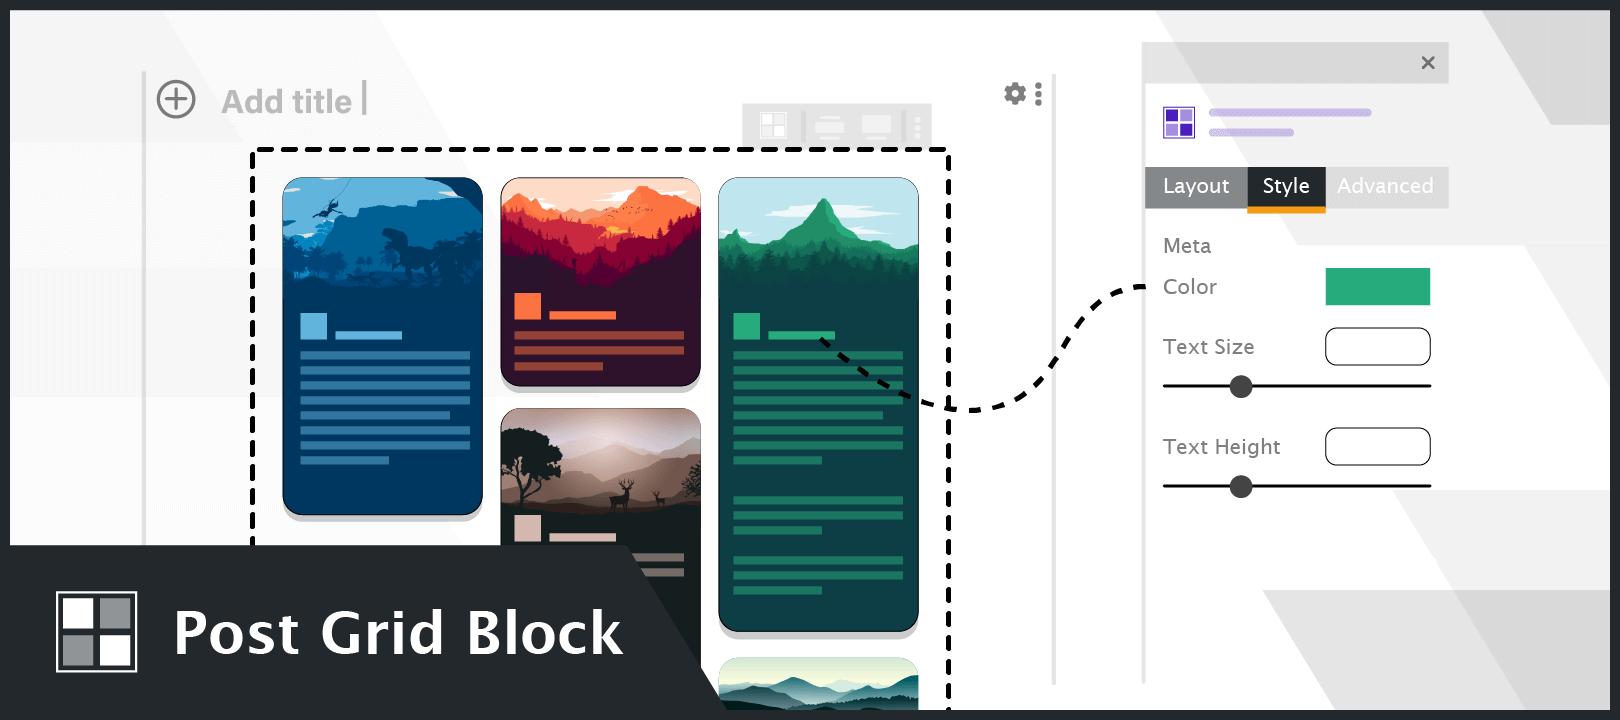 Post Grid Block